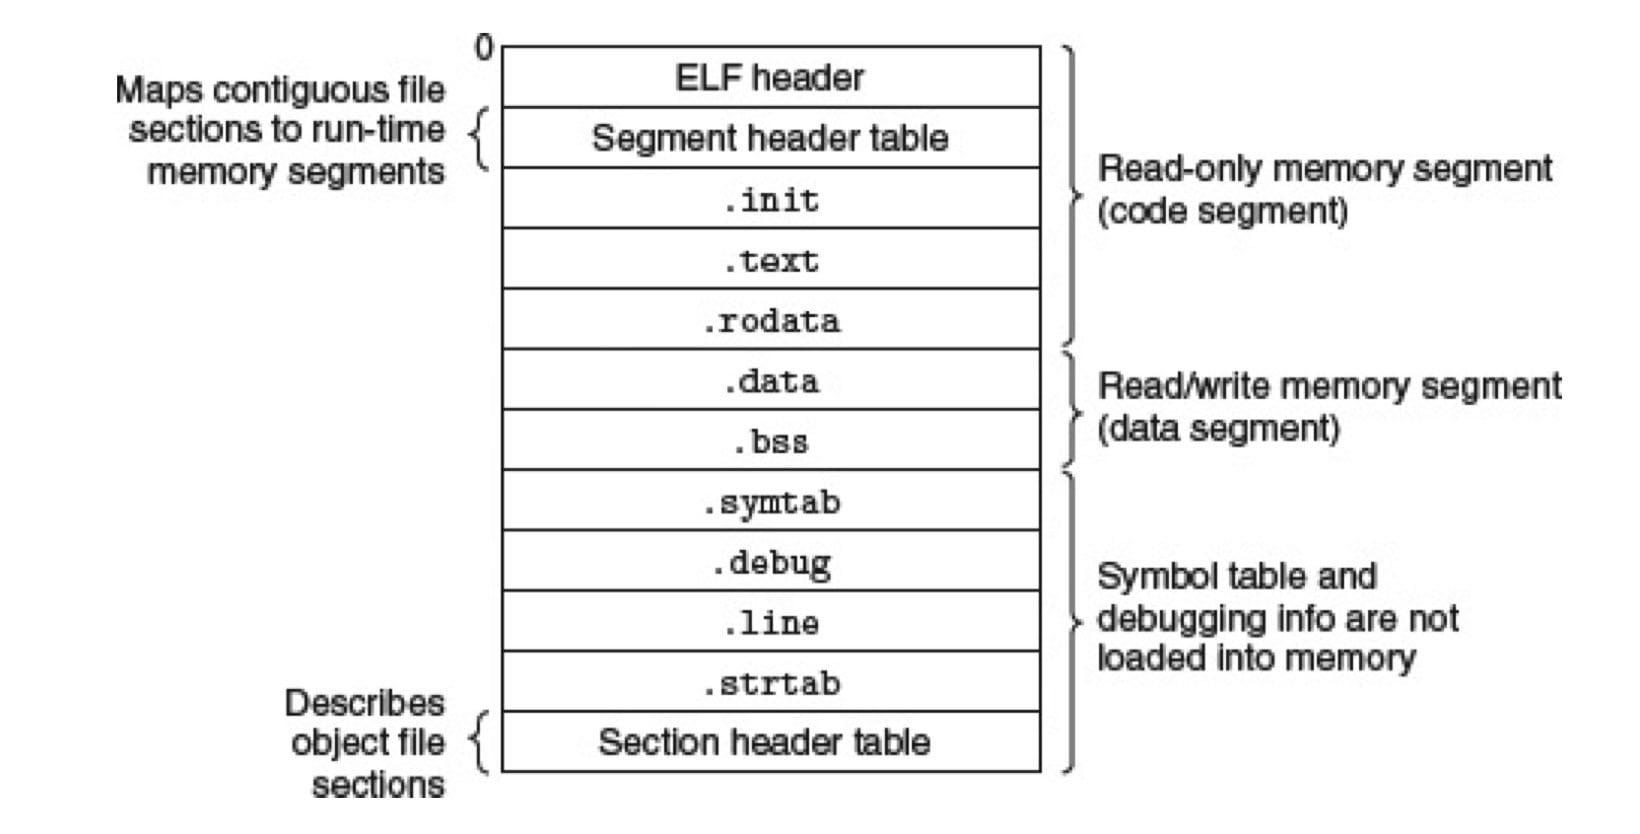 ELF 可执行文件中的各类信息(CSAPP 7-13)